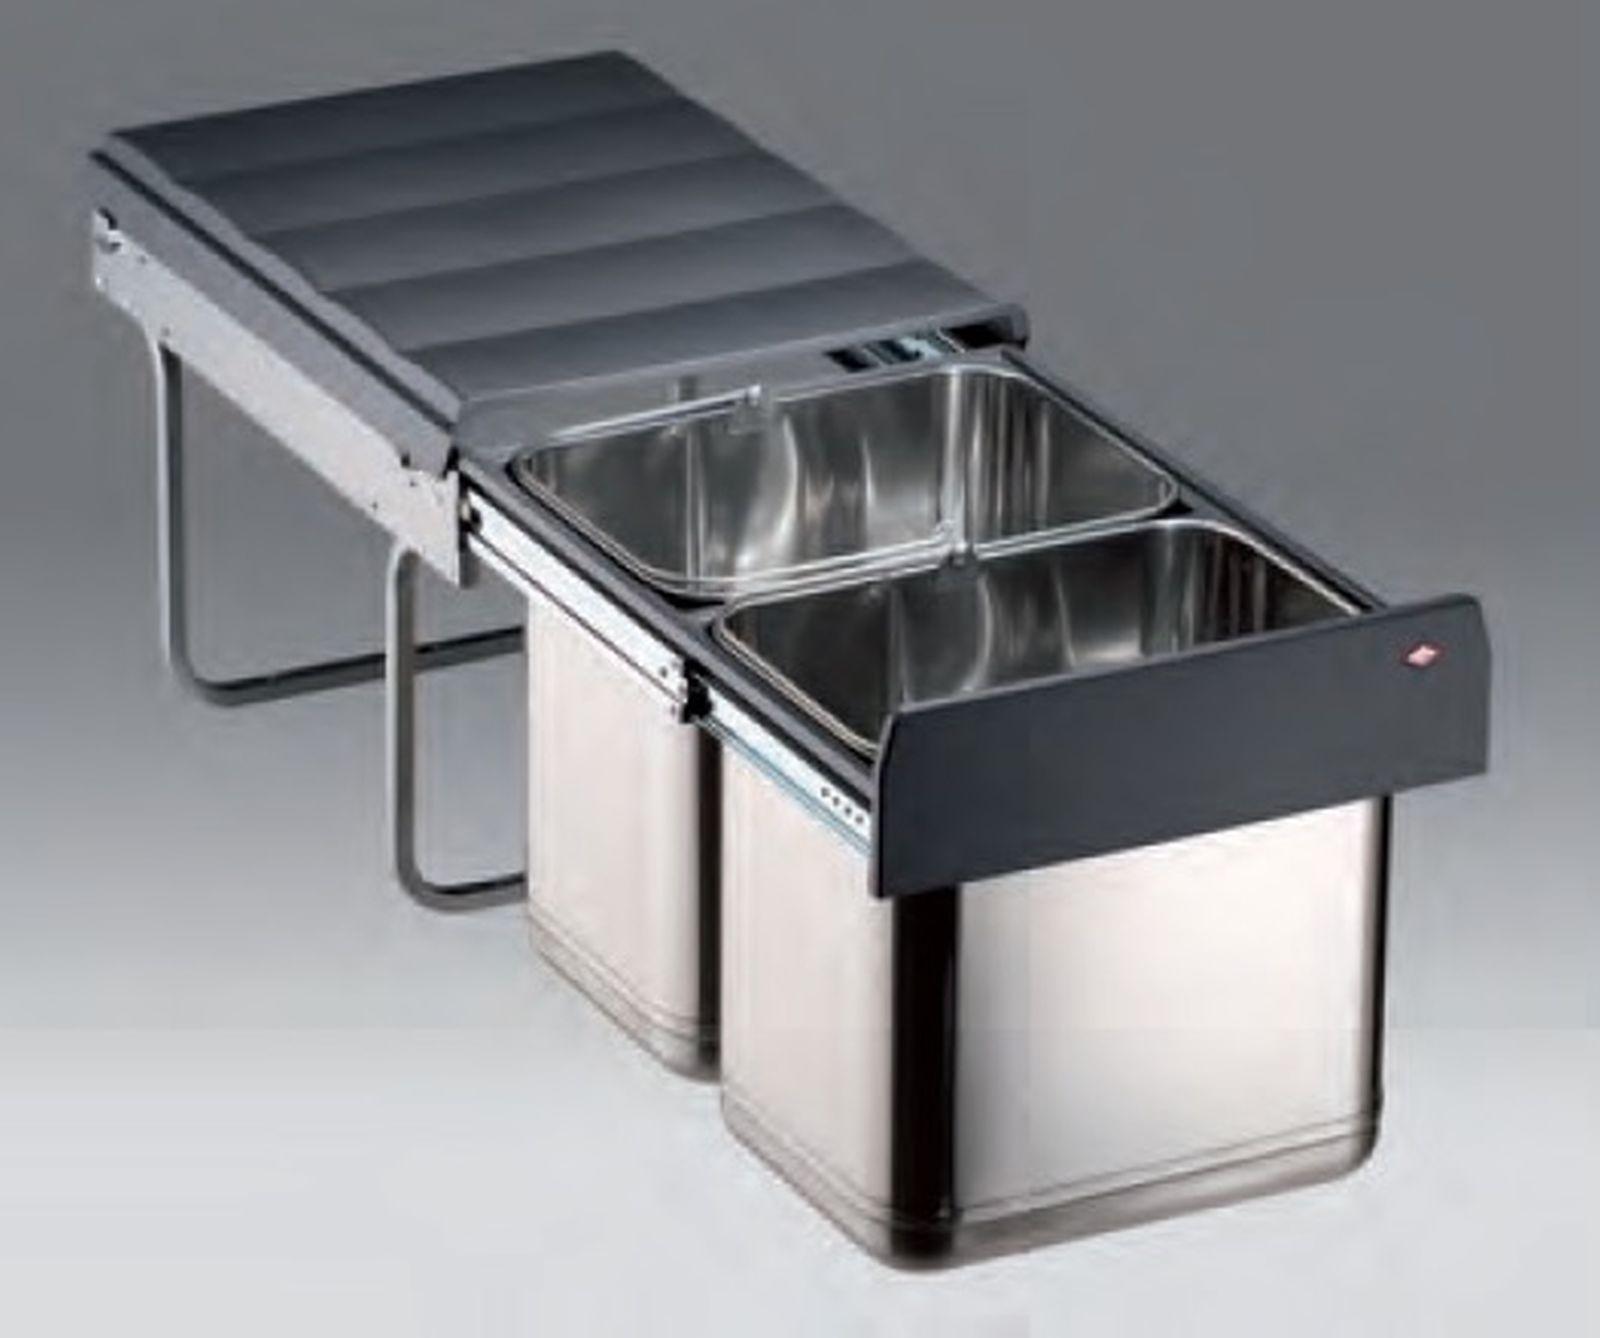 Wesco Edel Master 40DT Edelstahl Abfall-/Mülleimer Küche 2 x 16 ...